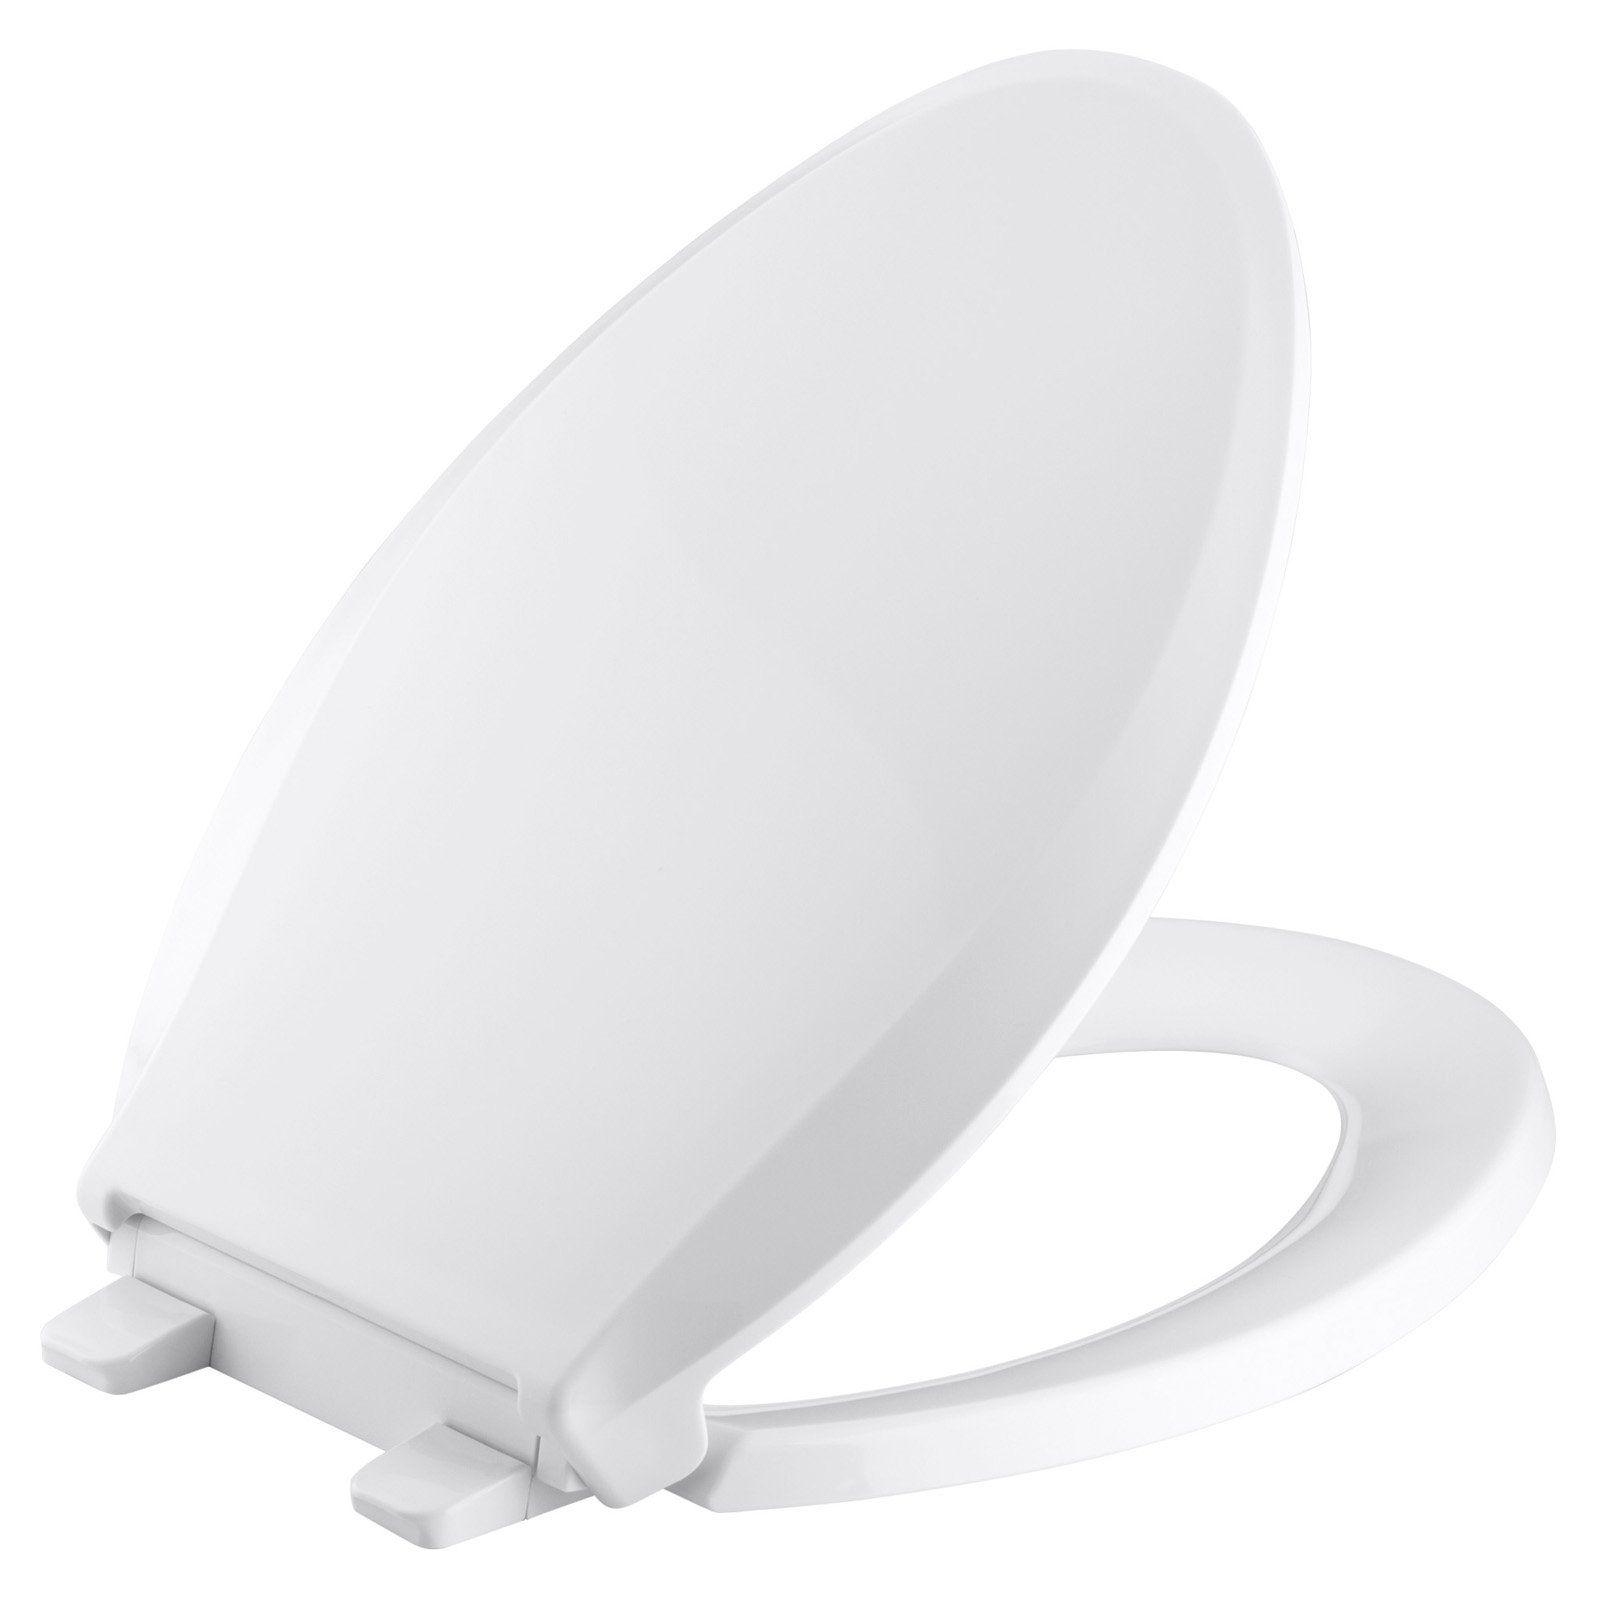 Kohler Cachet Quiet Close With Grip Tight Elongated Toilet Seat